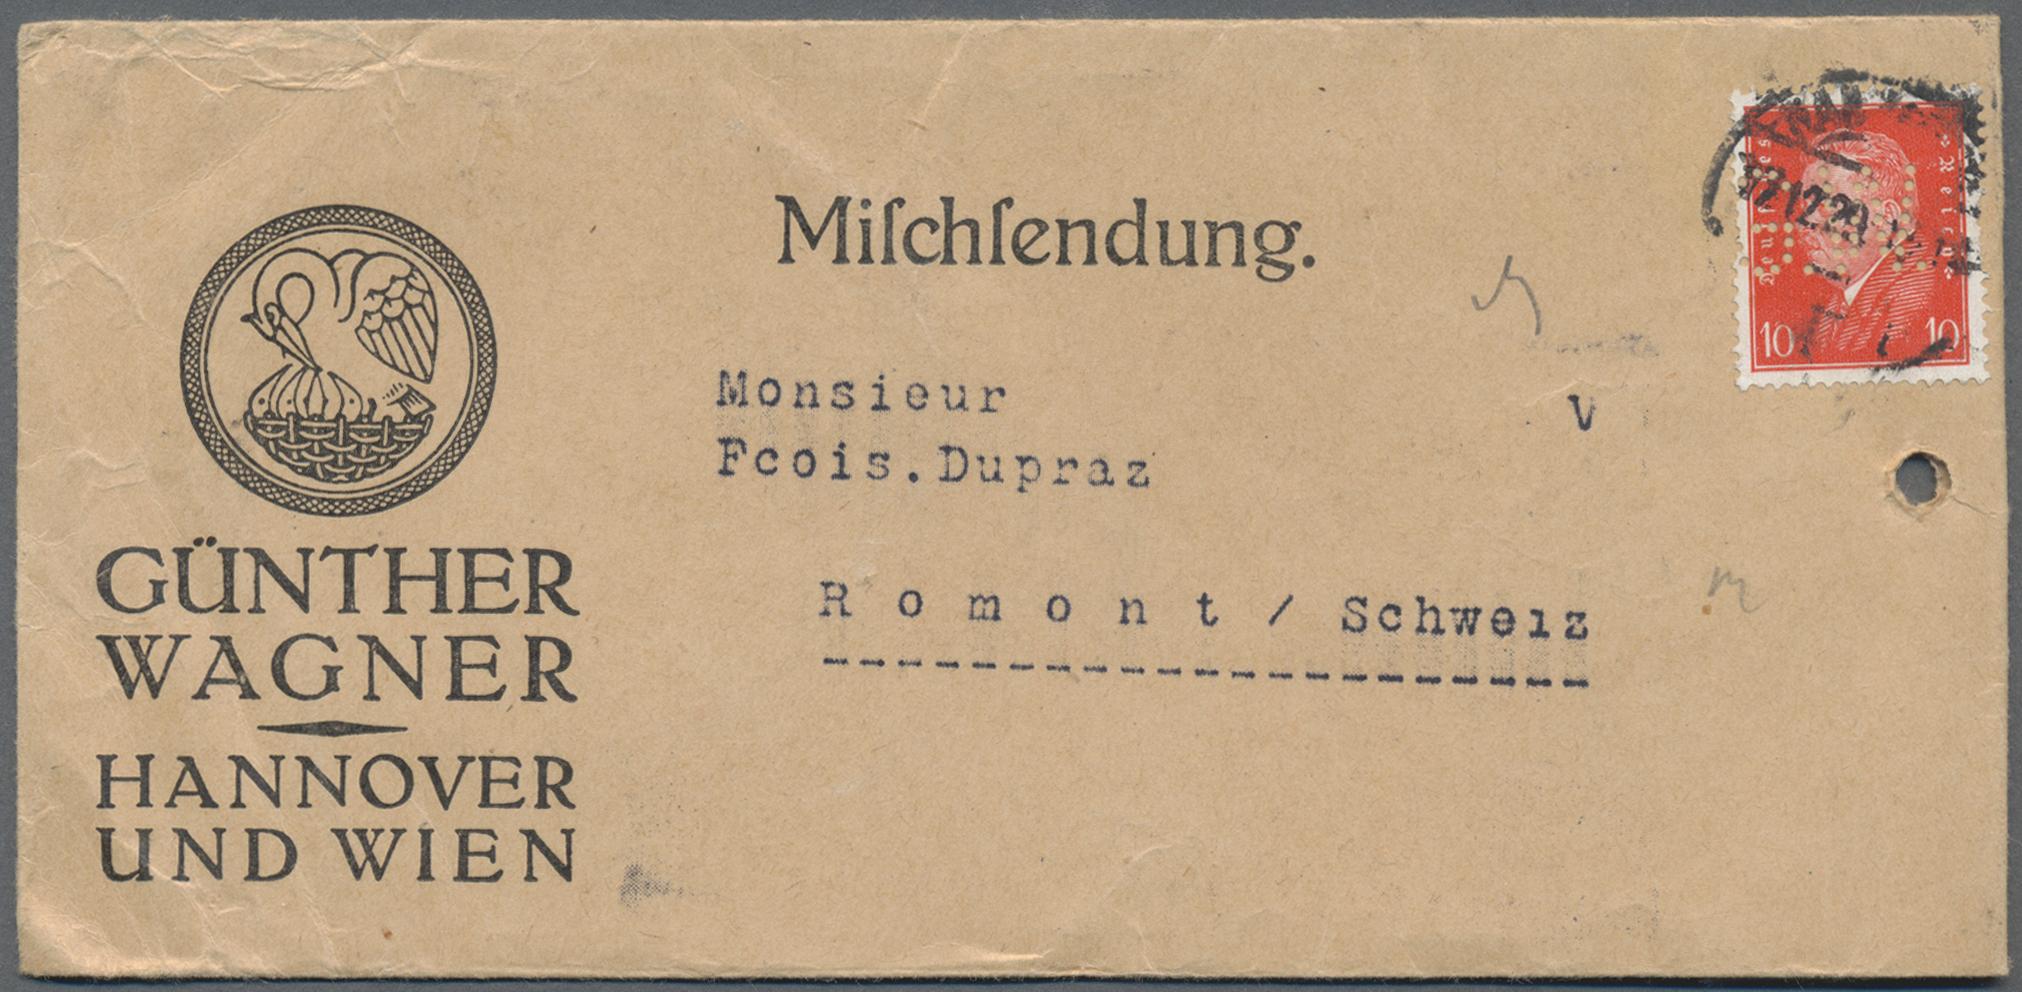 Lot 26295 - nachlässe  -  Auktionshaus Christoph Gärtner GmbH & Co. KG Sale #46 Gollcetions Germany - including the suplement